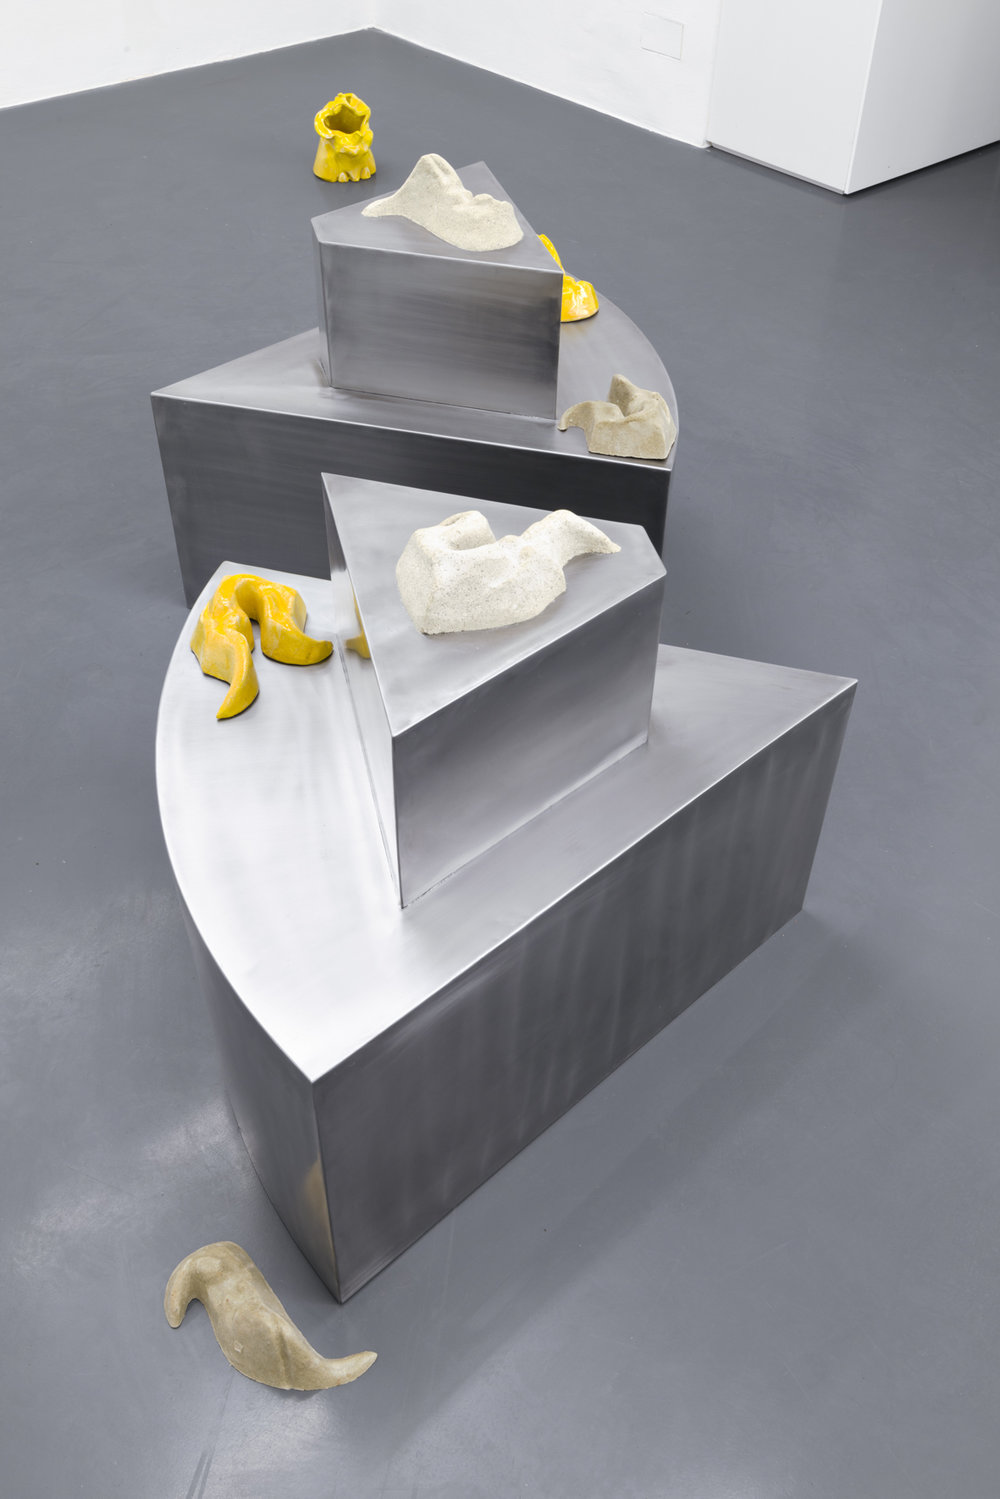 Lena Henke, My piece of cake, 2016, Metal, sand, silicone, glazed ceramics 90 x 90 x 70 cm, Courtesy: Galerie Emanuel Layr